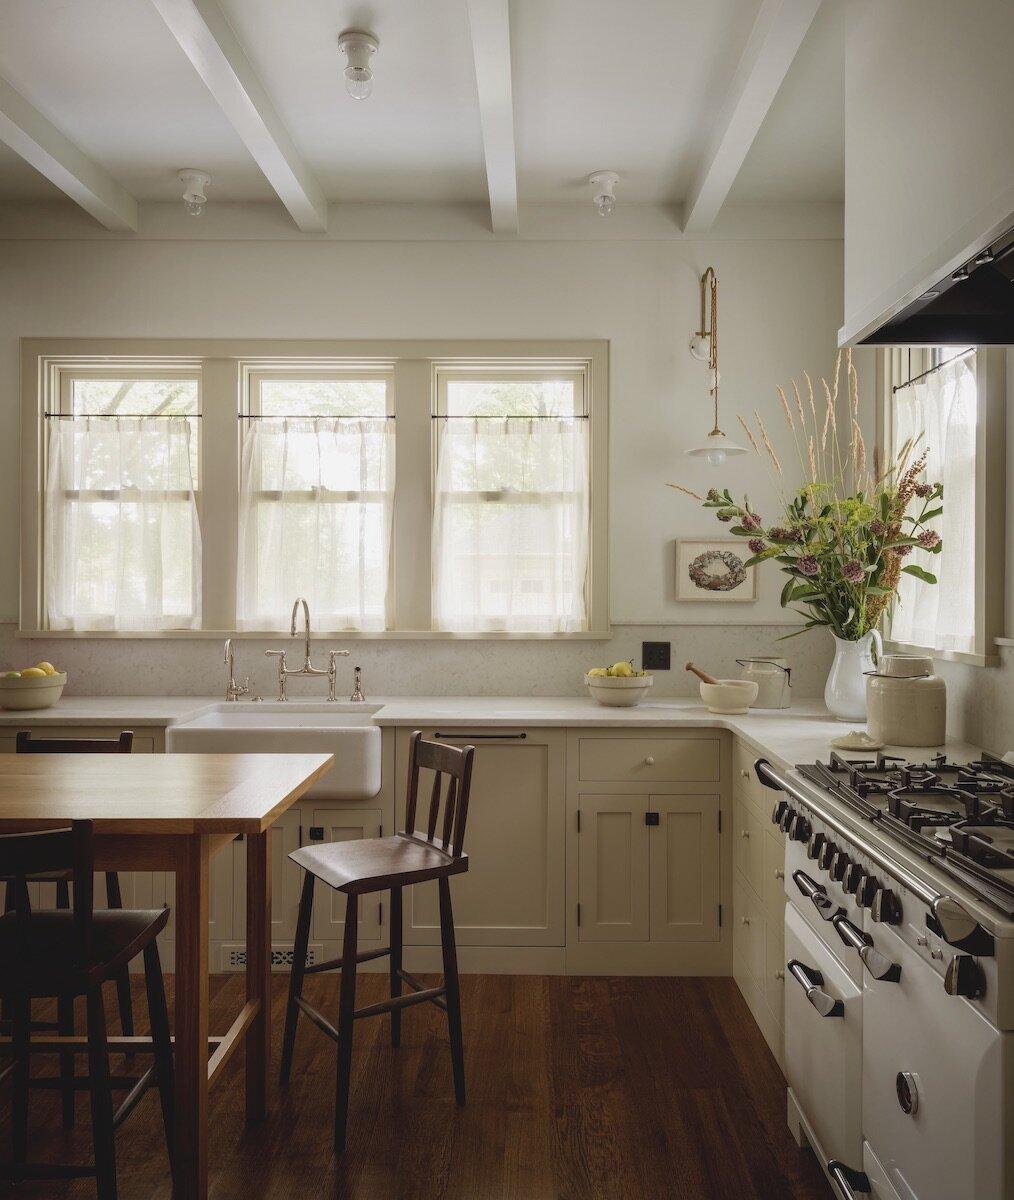 kitchen-iowa-city-house-jessica-helgerson-nordroom